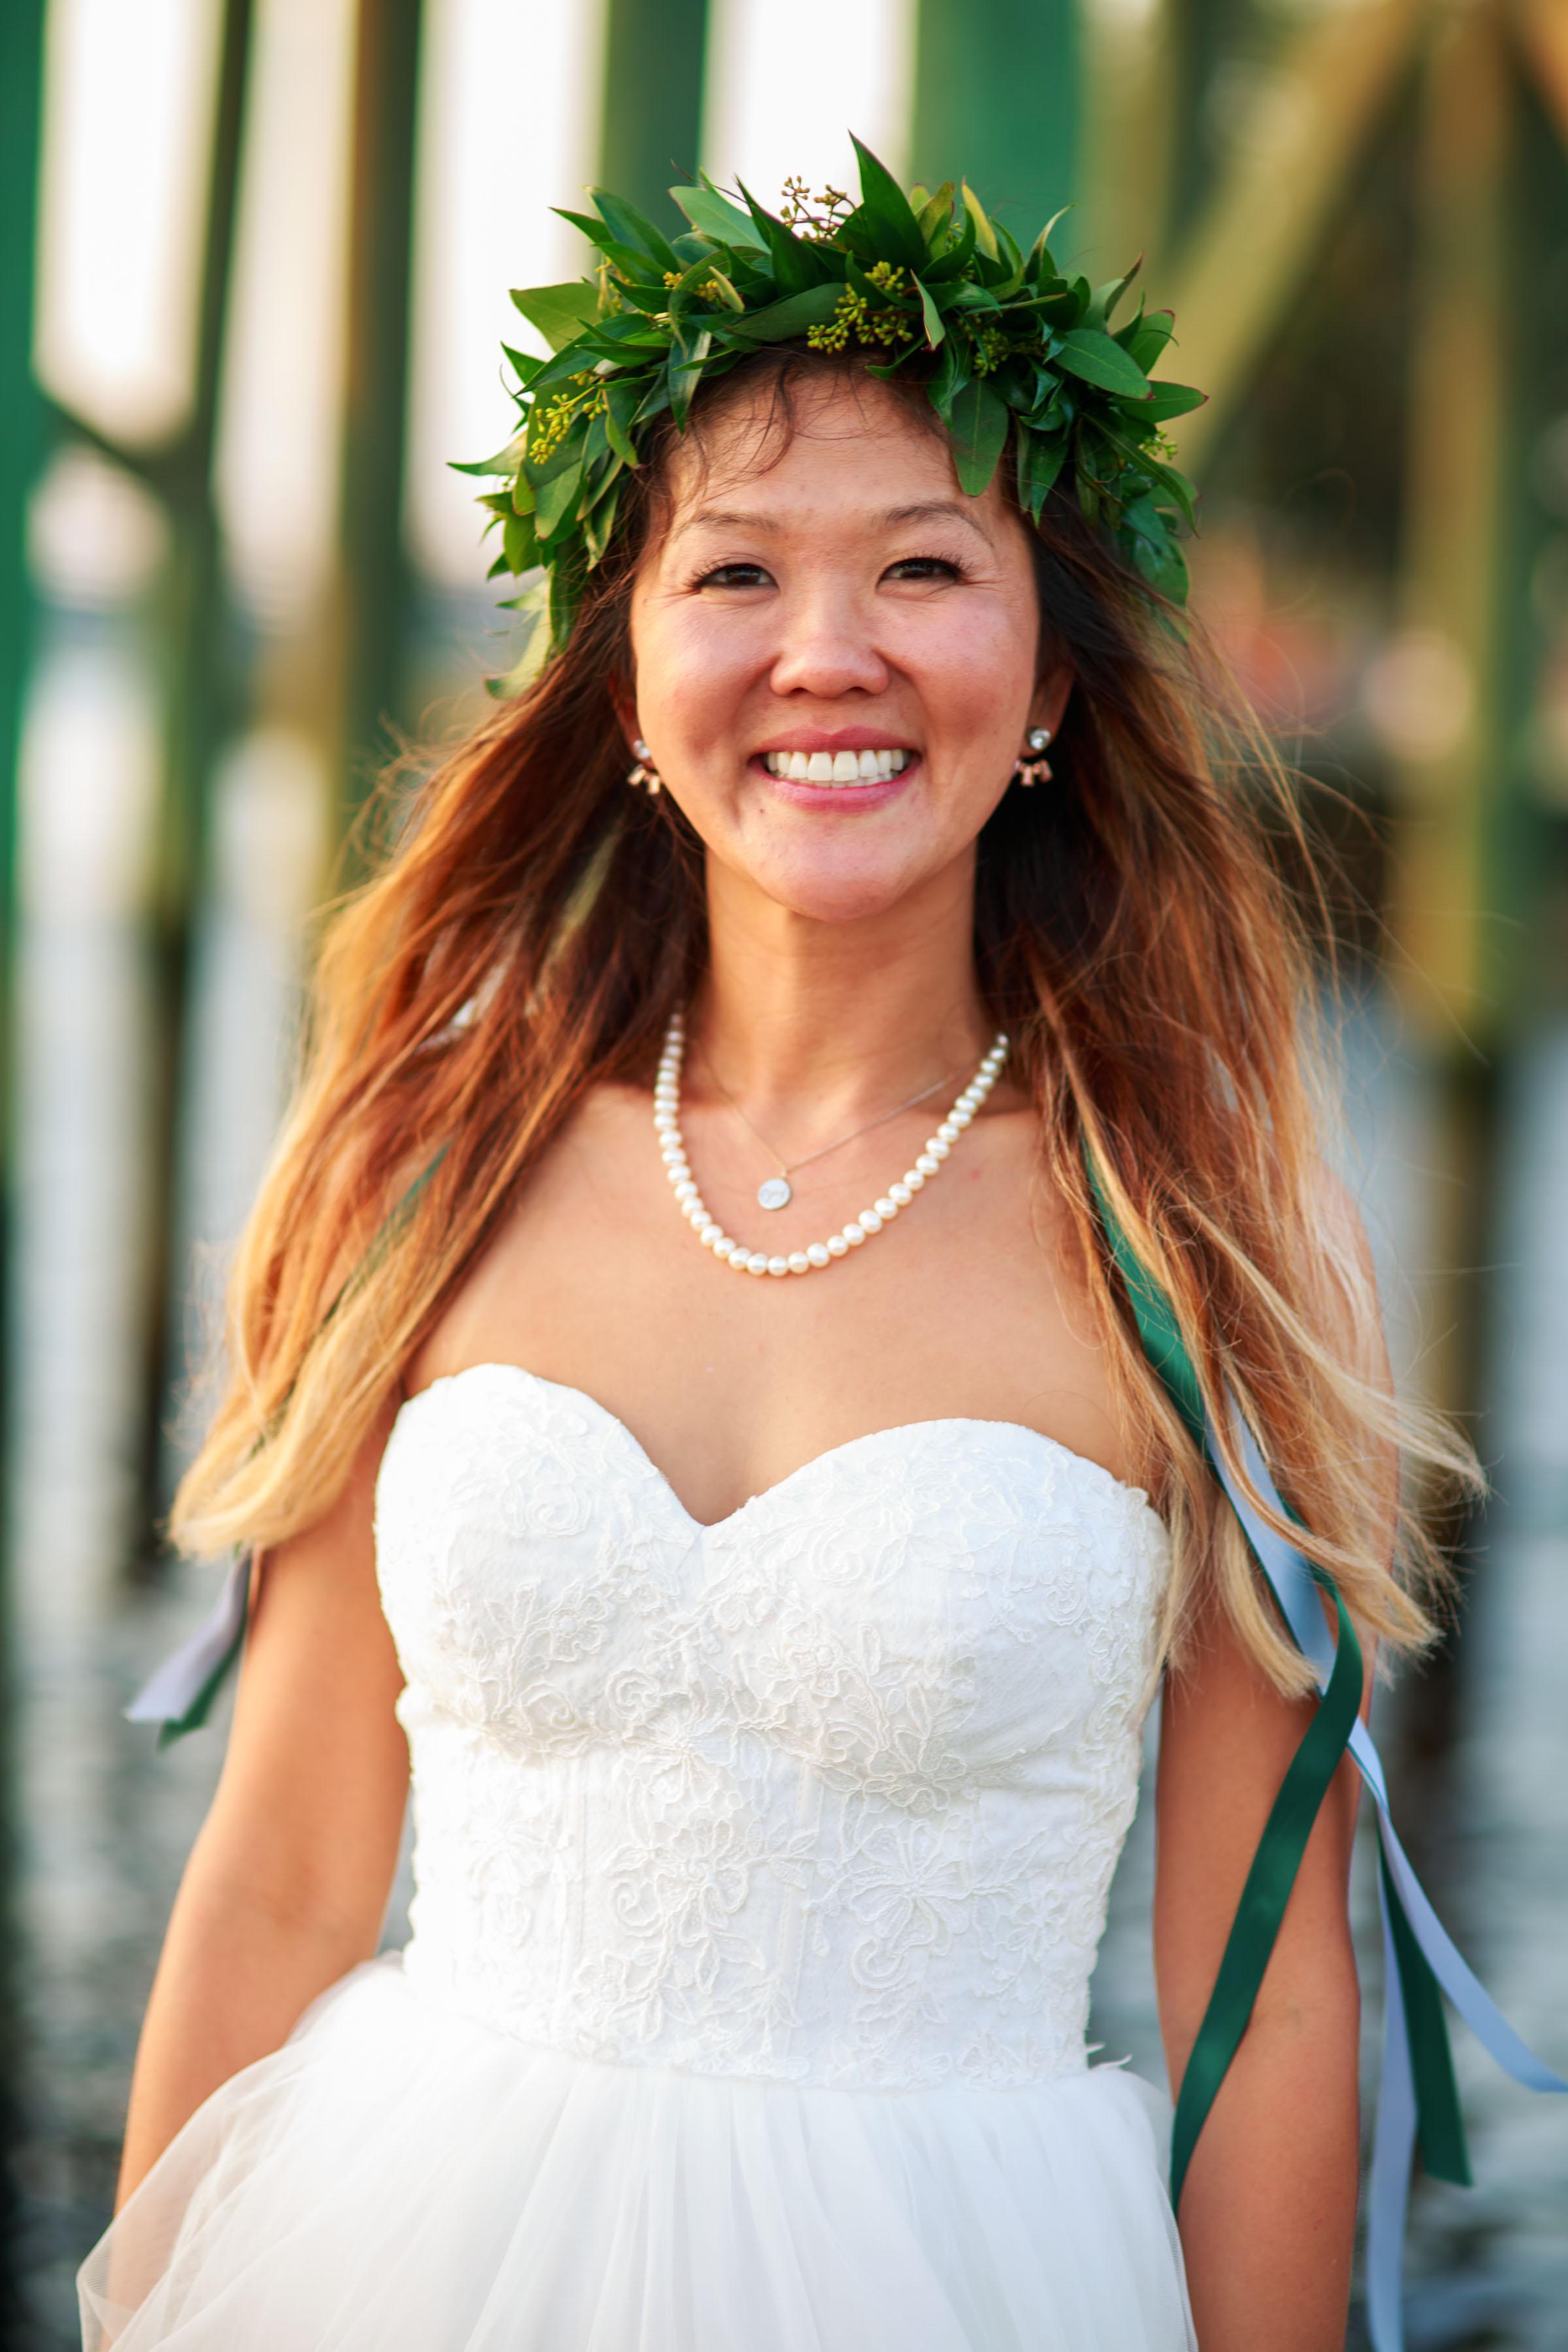 North_Carolina_Wedding_Photographer_Tiffany_Abruzzo_Bride&Groom_46.jpg